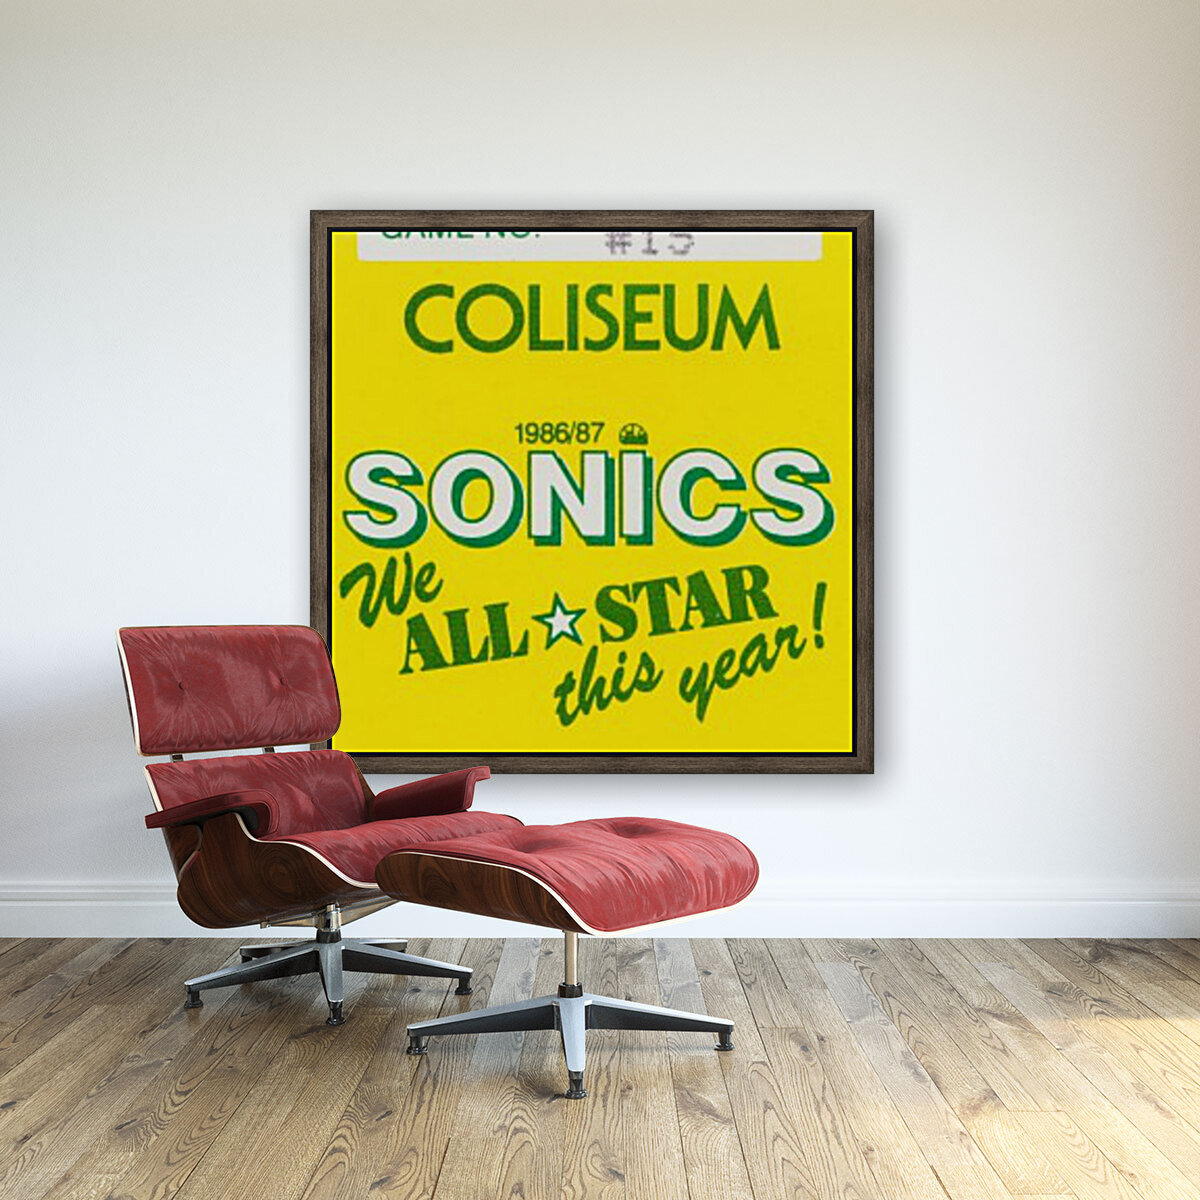 1986 seattle supersonics ticket stub canvas art  Art